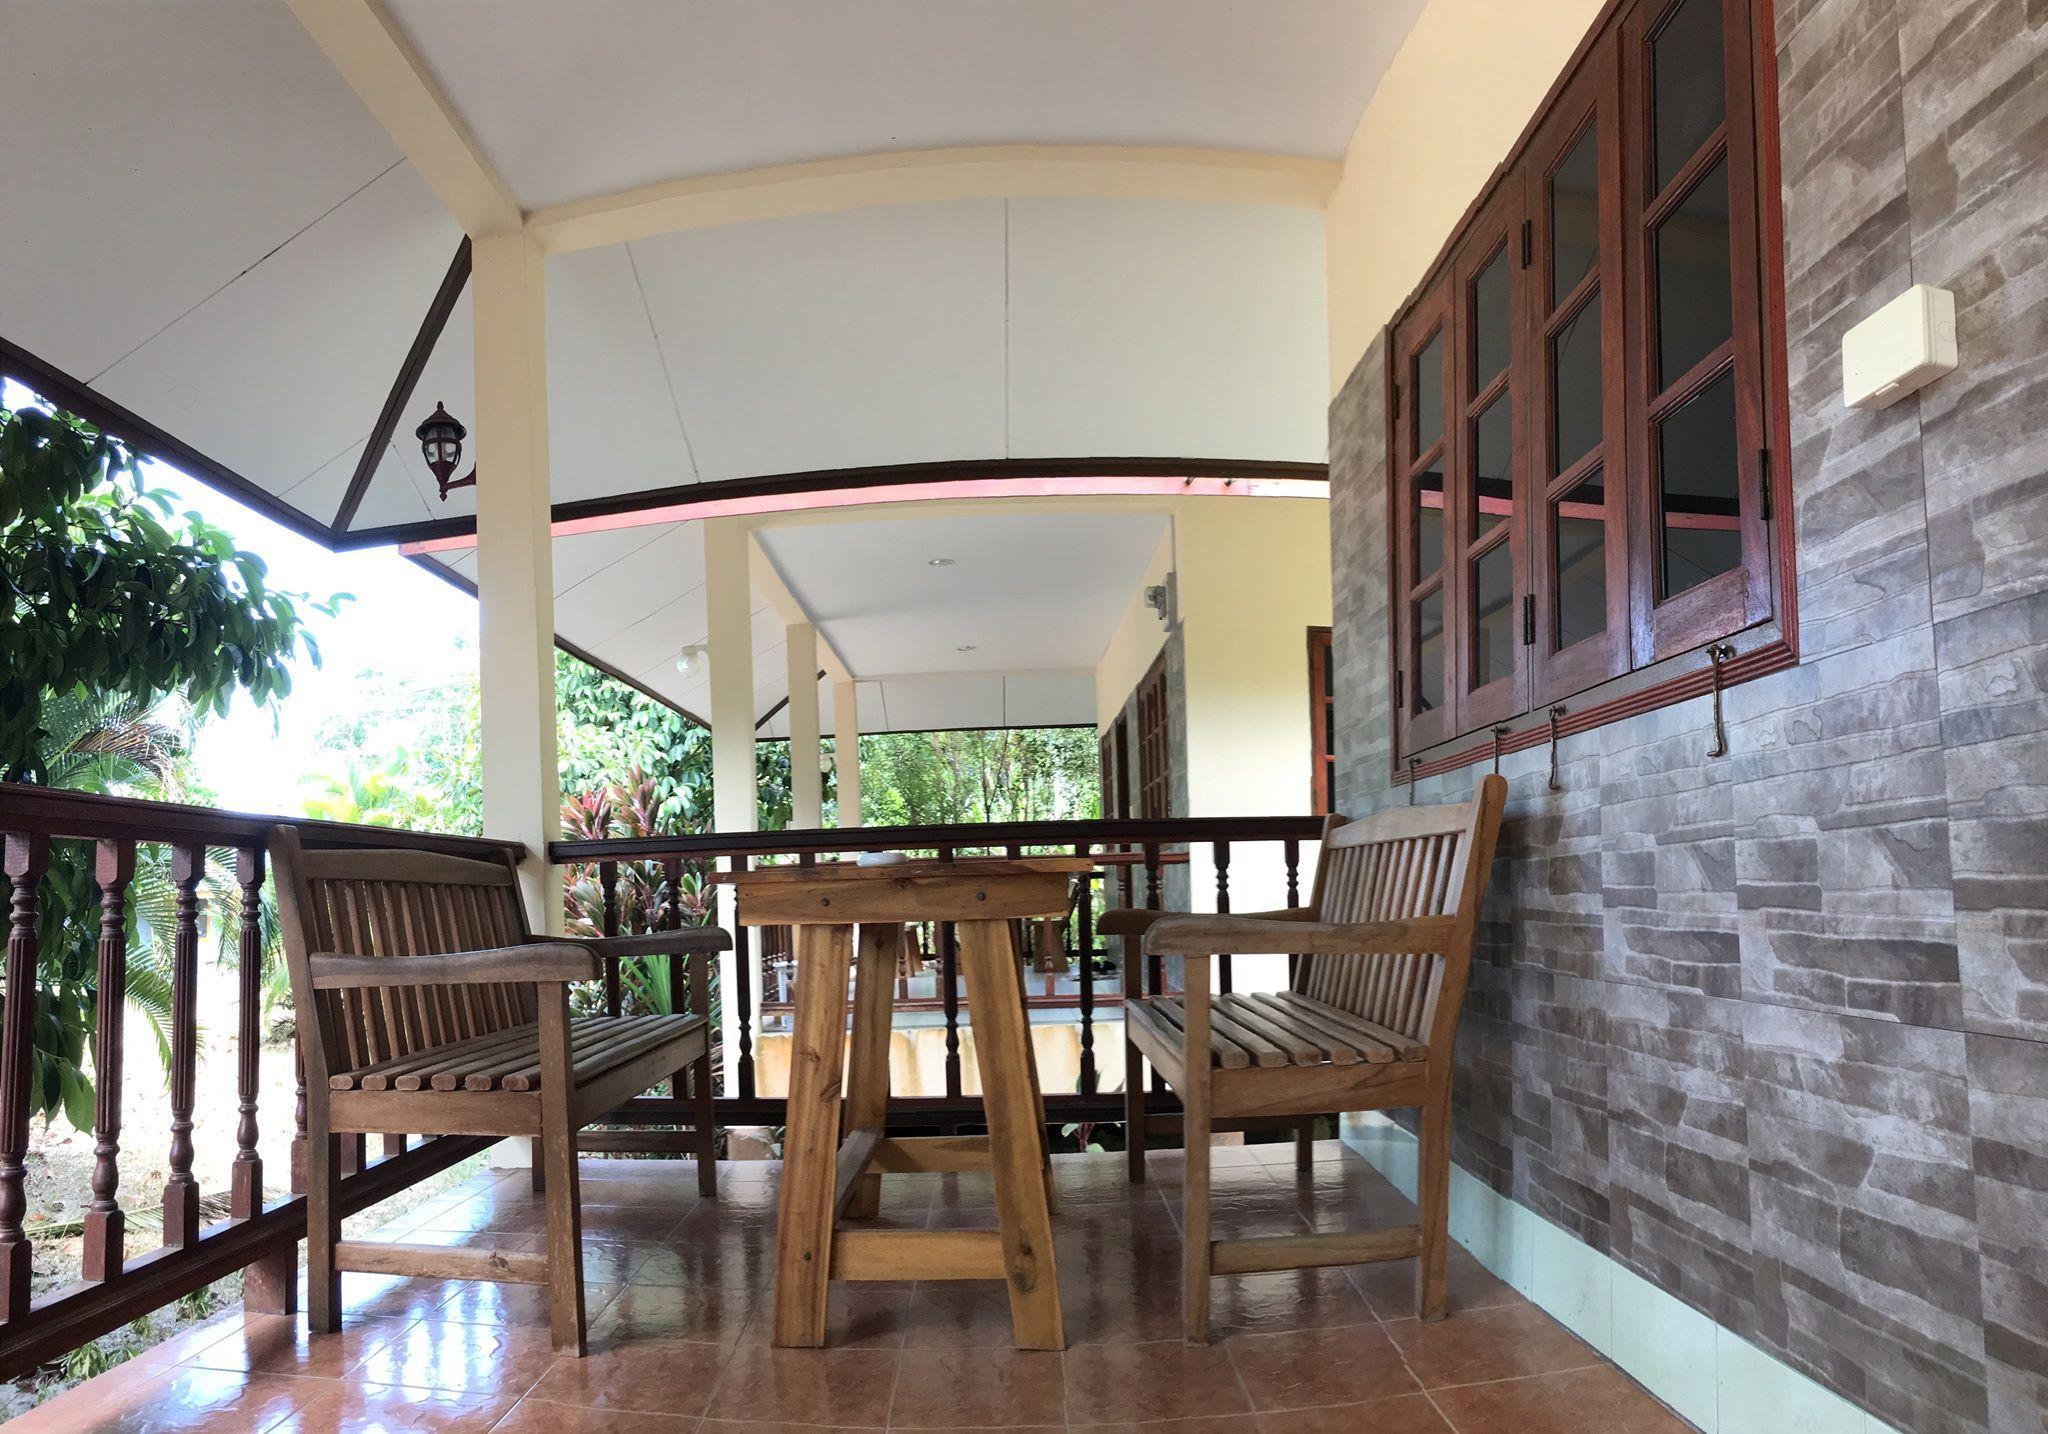 Maneerat Goat Farm Phuket Room No. 2